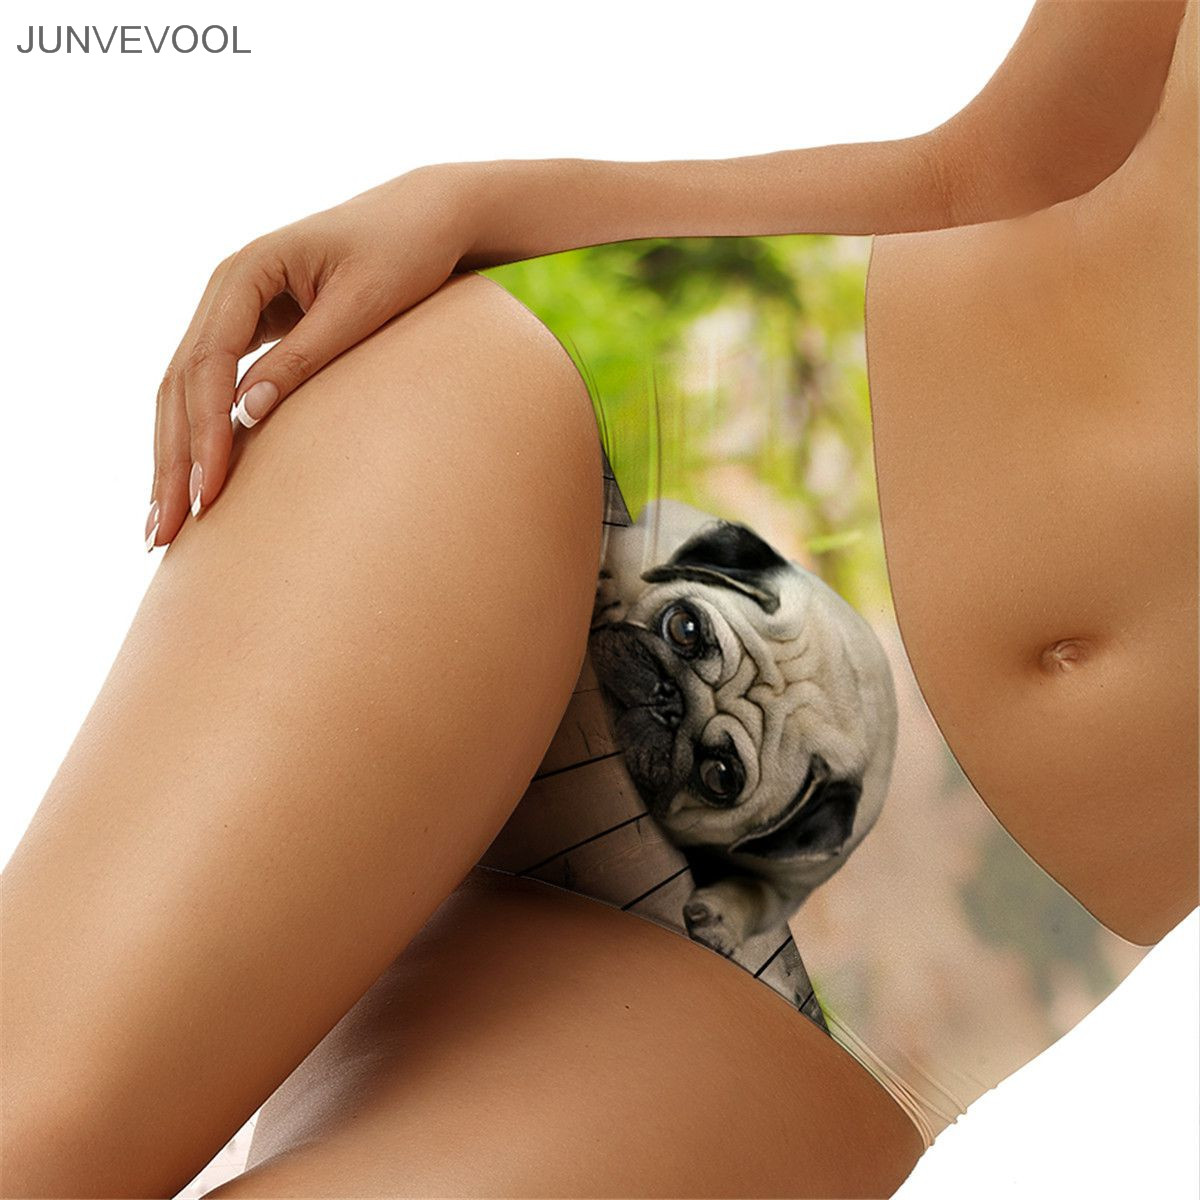 Buy Panty Sexy Women Lady Shorts Pants Middle Waist 3D Tattoo Shar Pei Dog Print Panties Briefs Knickers 2018 Lingerie Underwear